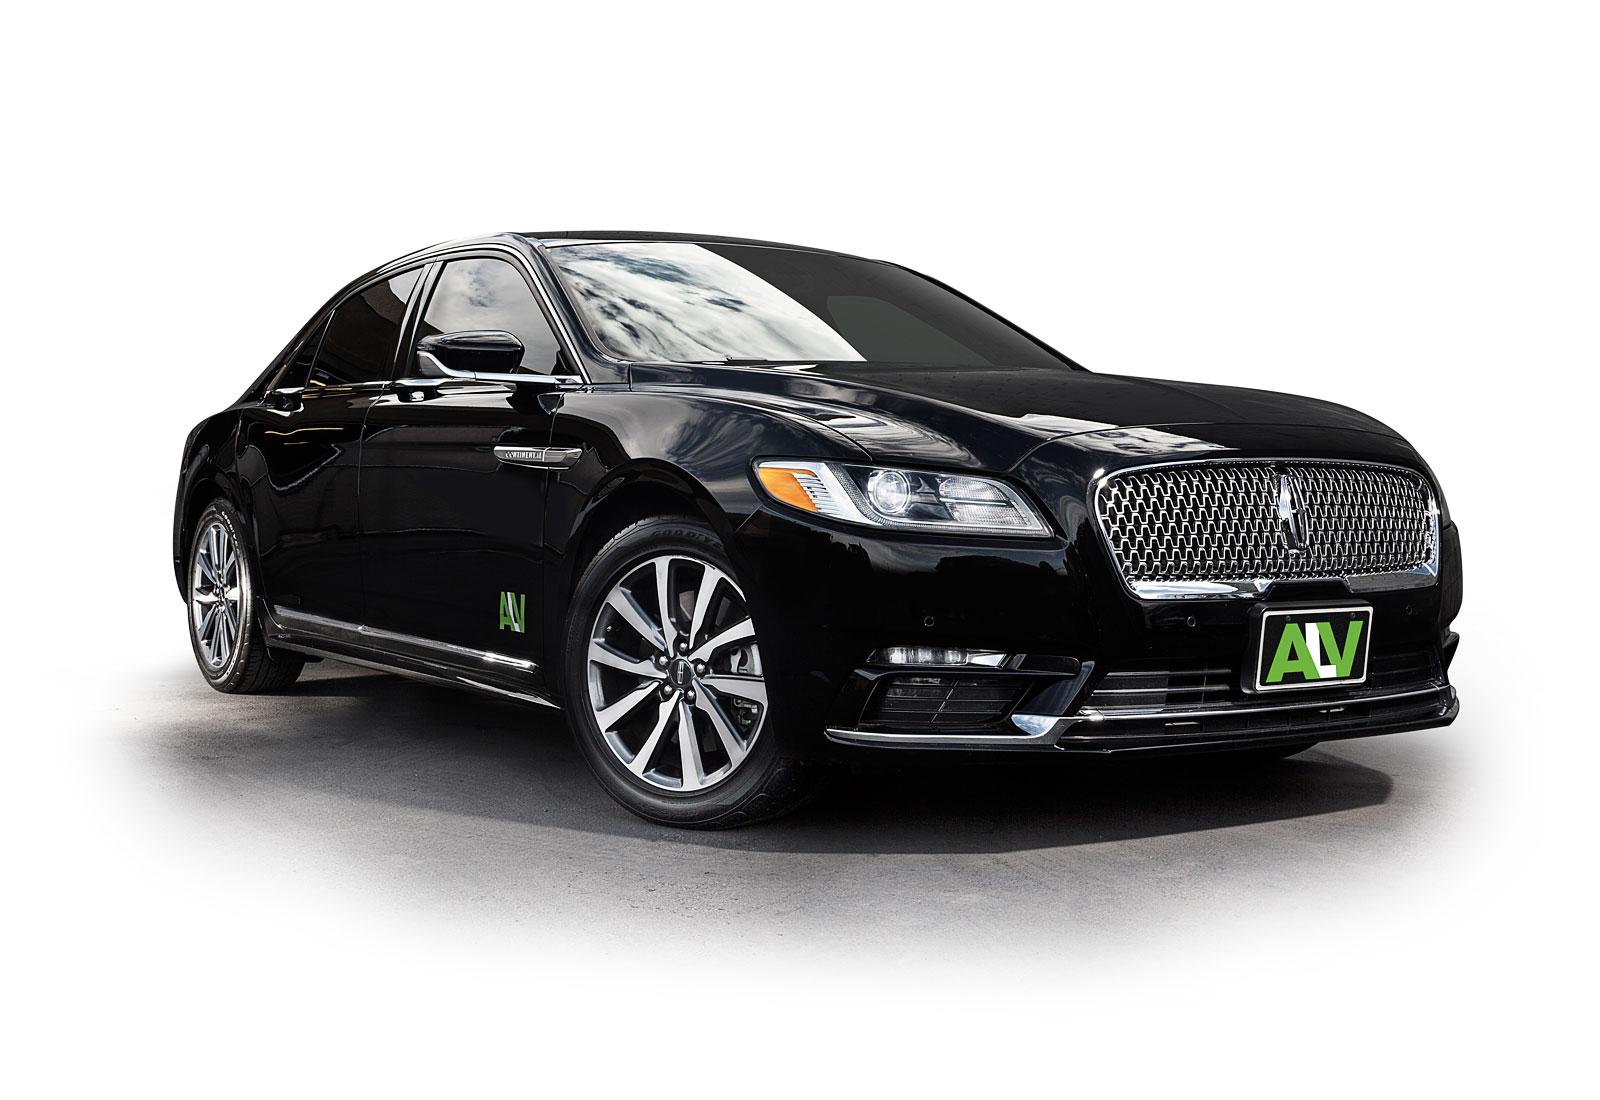 ALV Lincoln Sedan